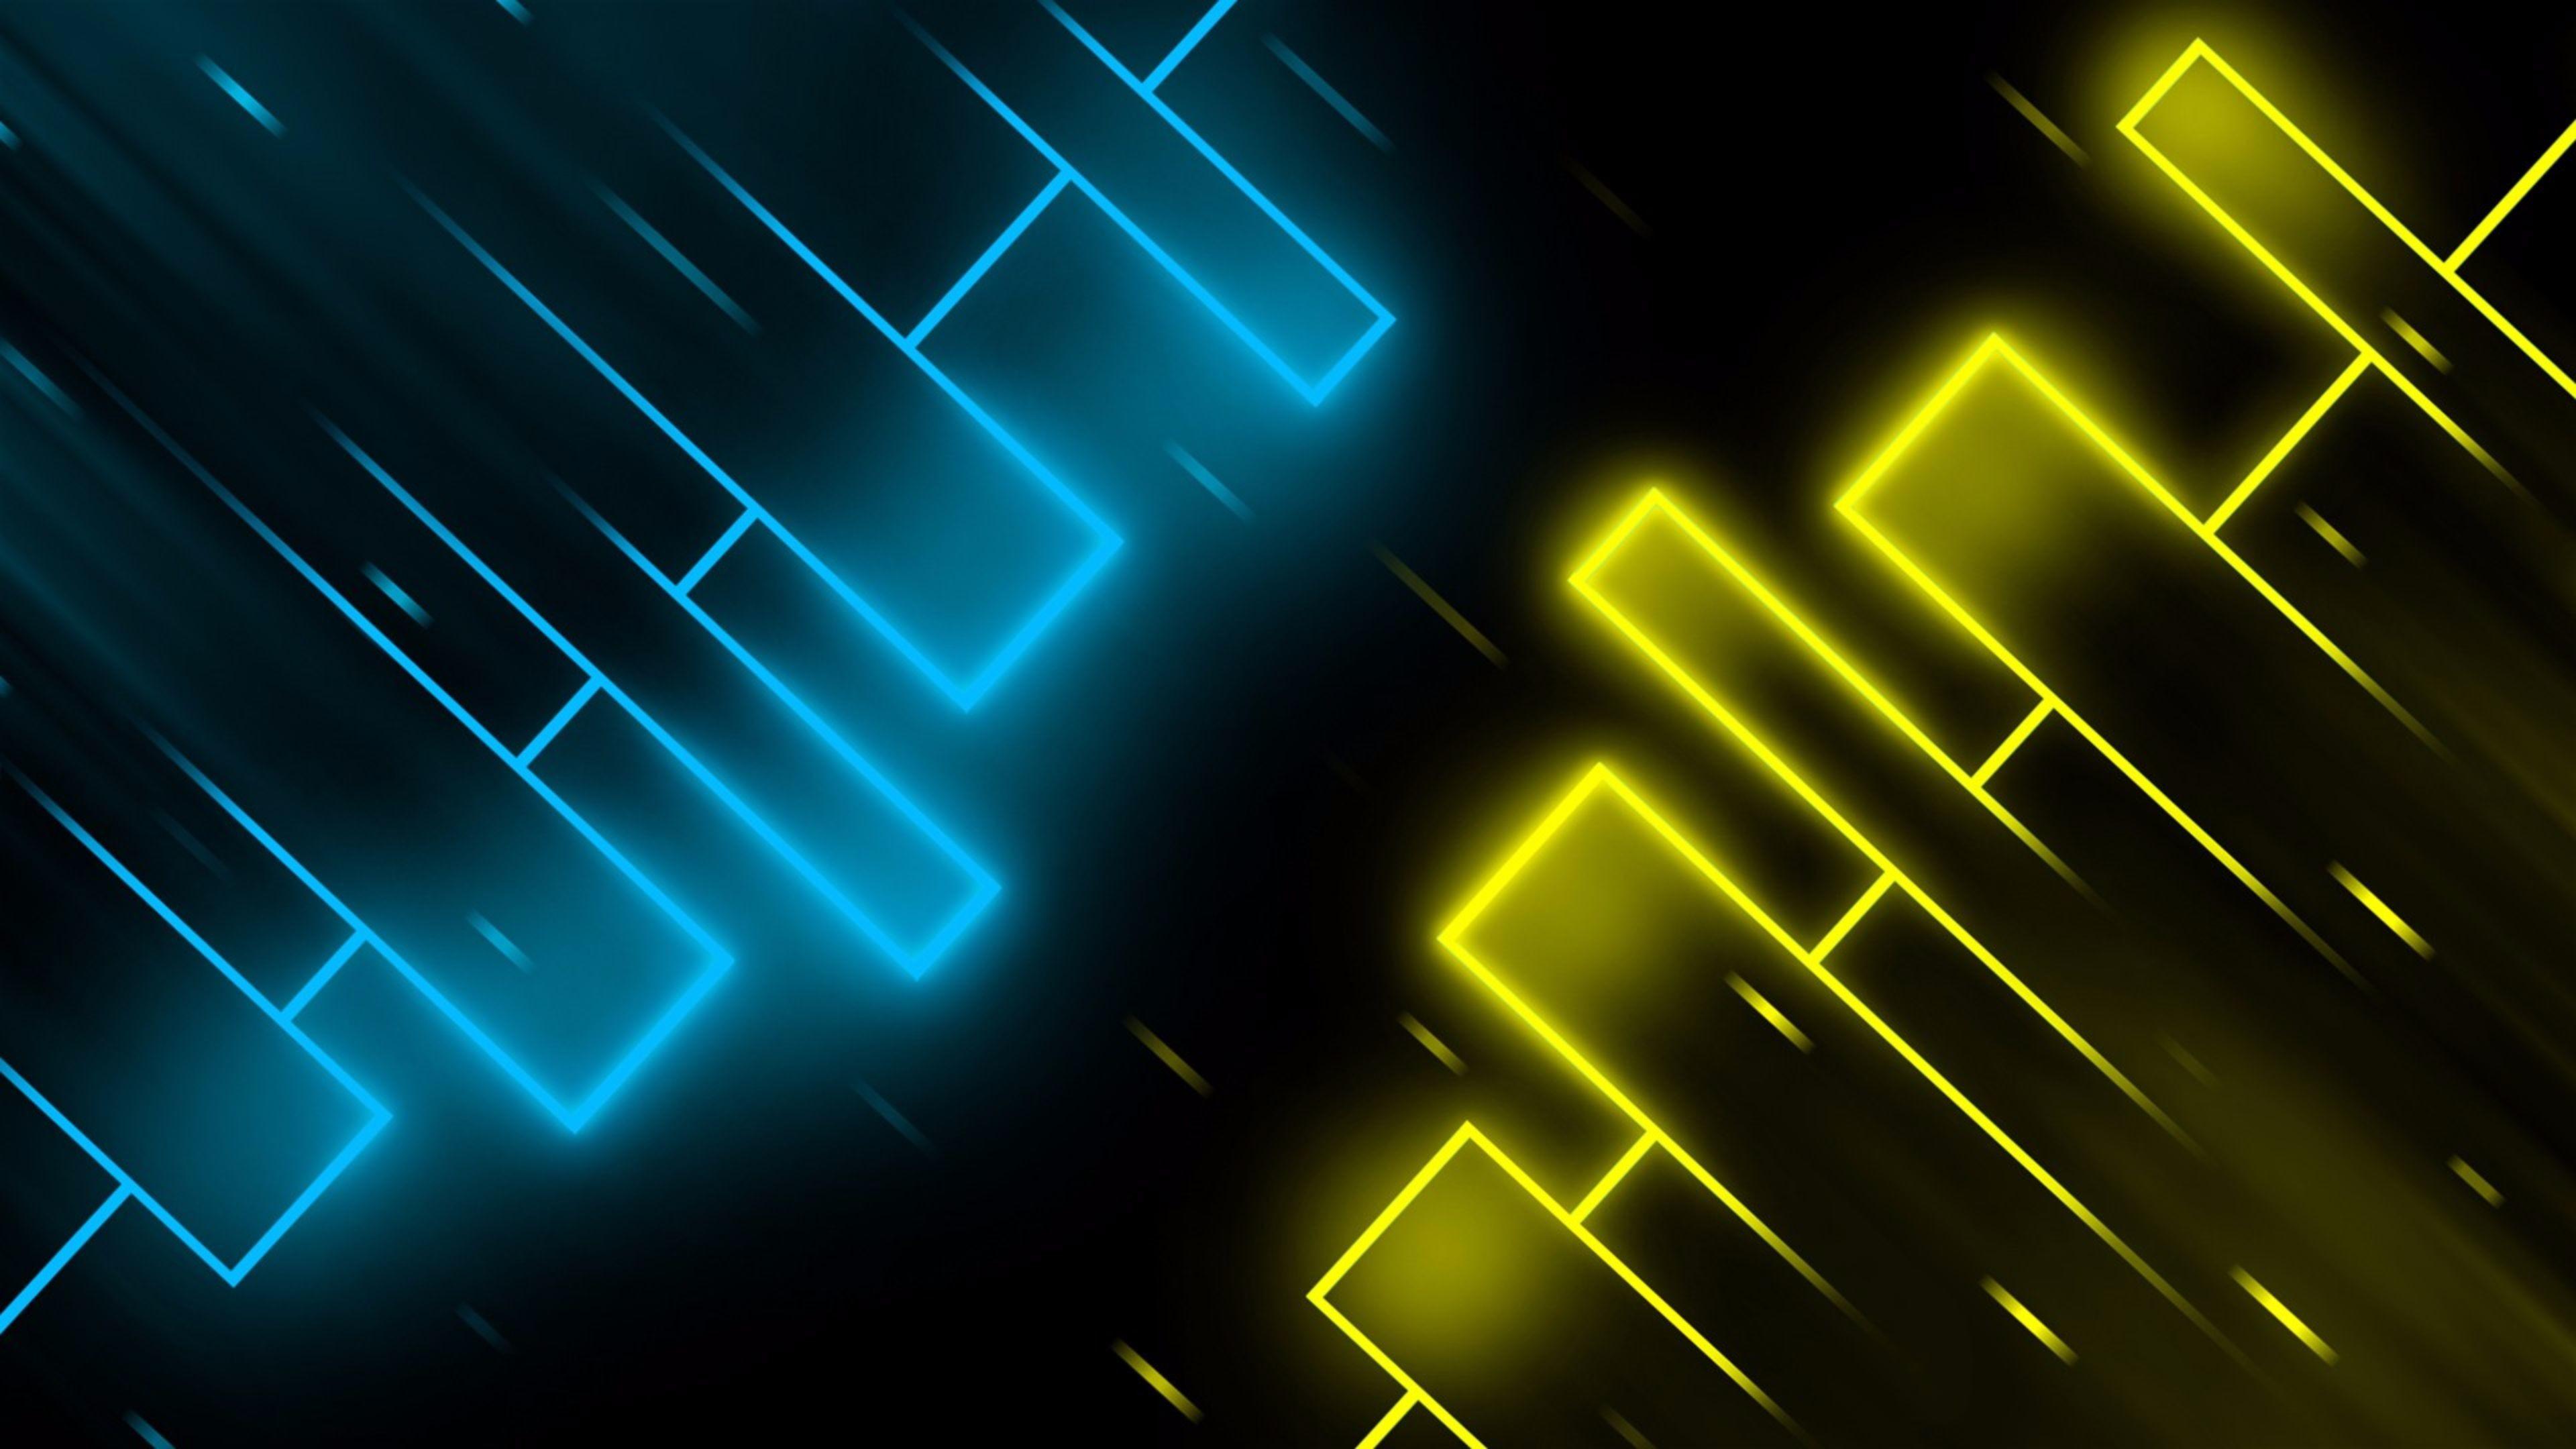 wallpaper.wiki-Blue-and-Gold-Desktop-Wallpaper-PIC-